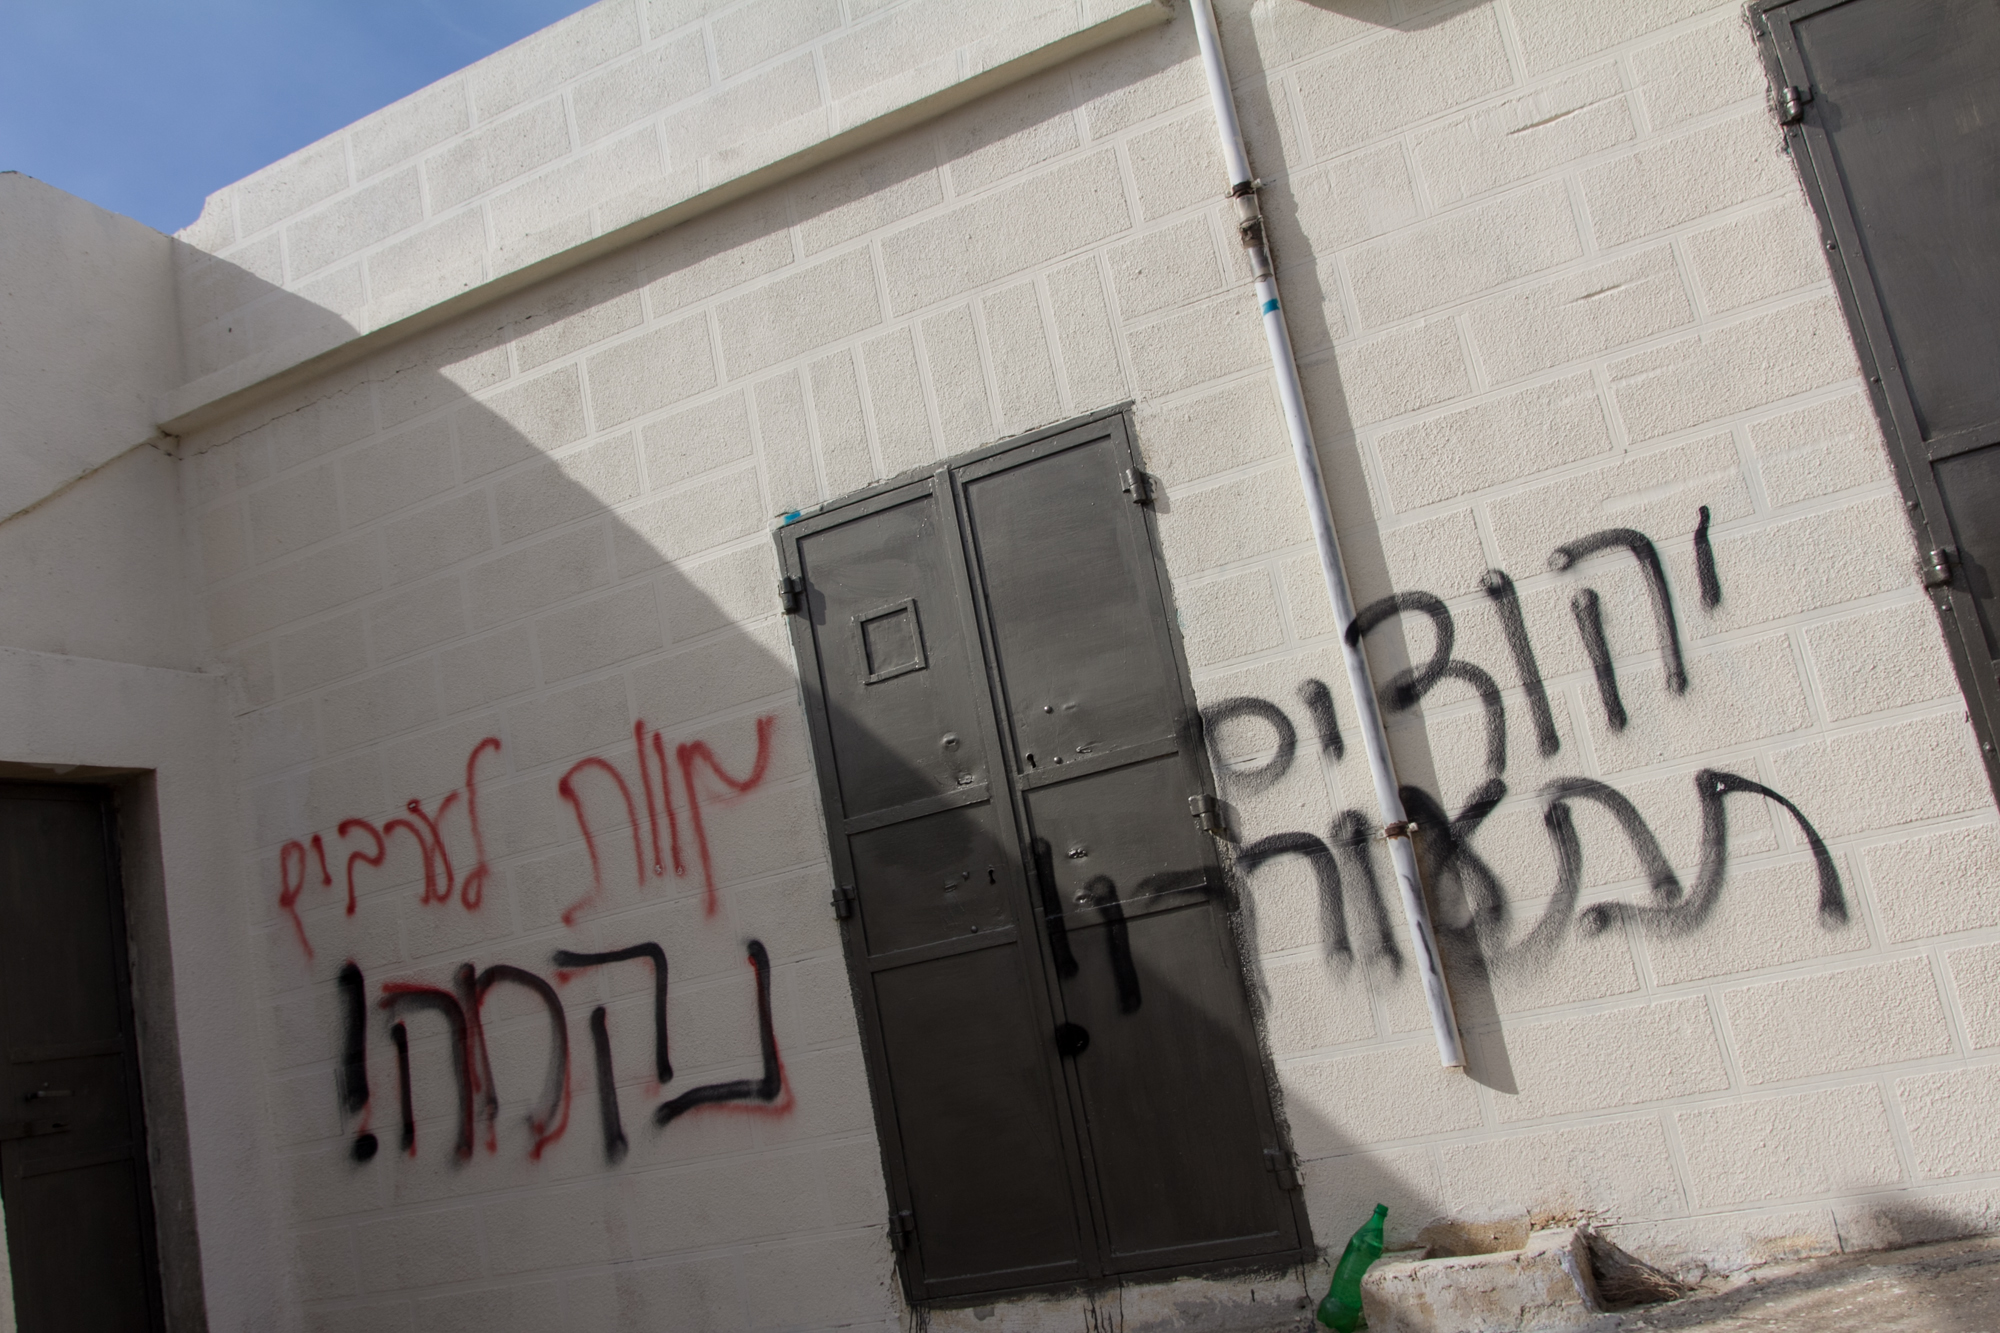 Price tag graffiti on a Palestinian house near the Israeli settlement of Ma'ale Levona. By Oren Rozen.